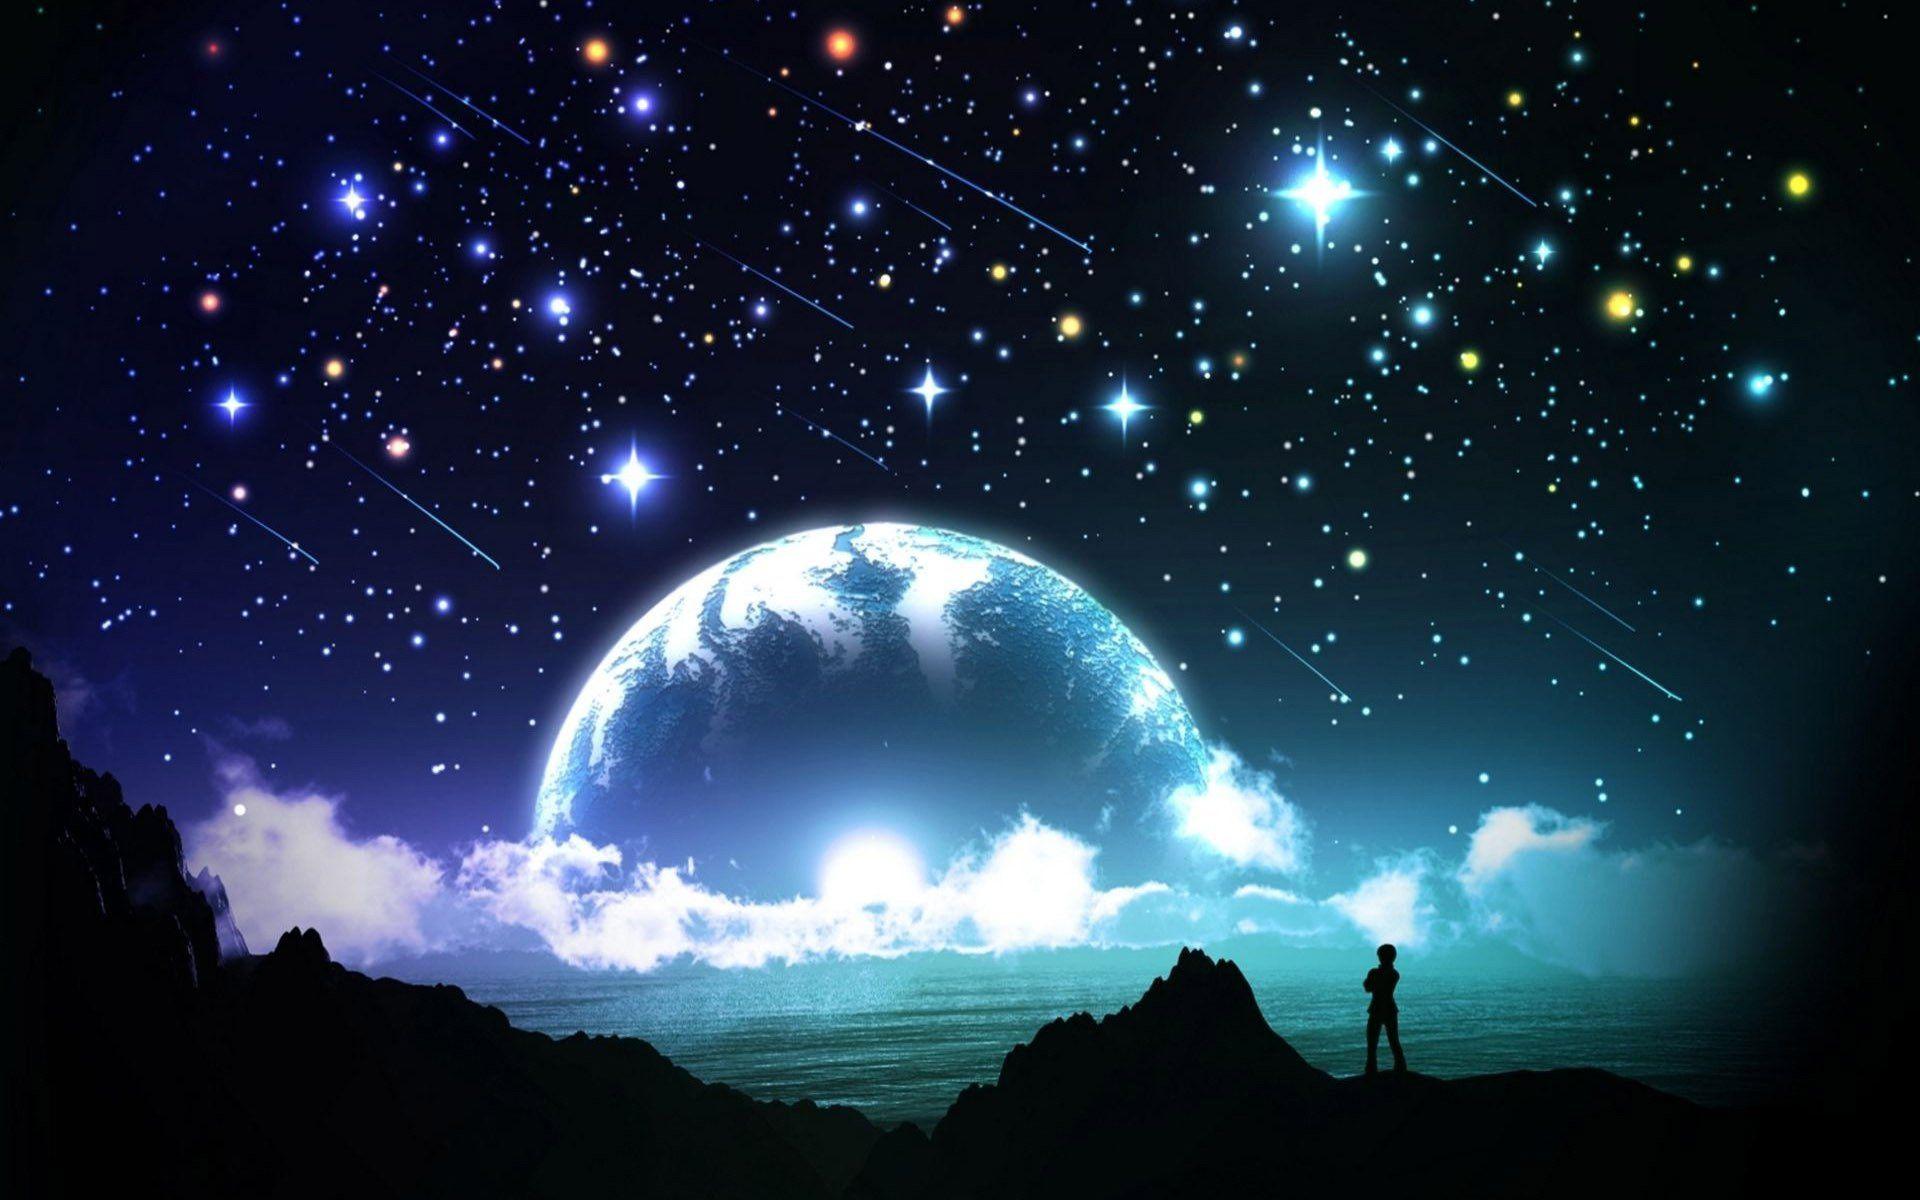 Hd wallpaper night - Wallpapers Night Sky Wallpaper Hd